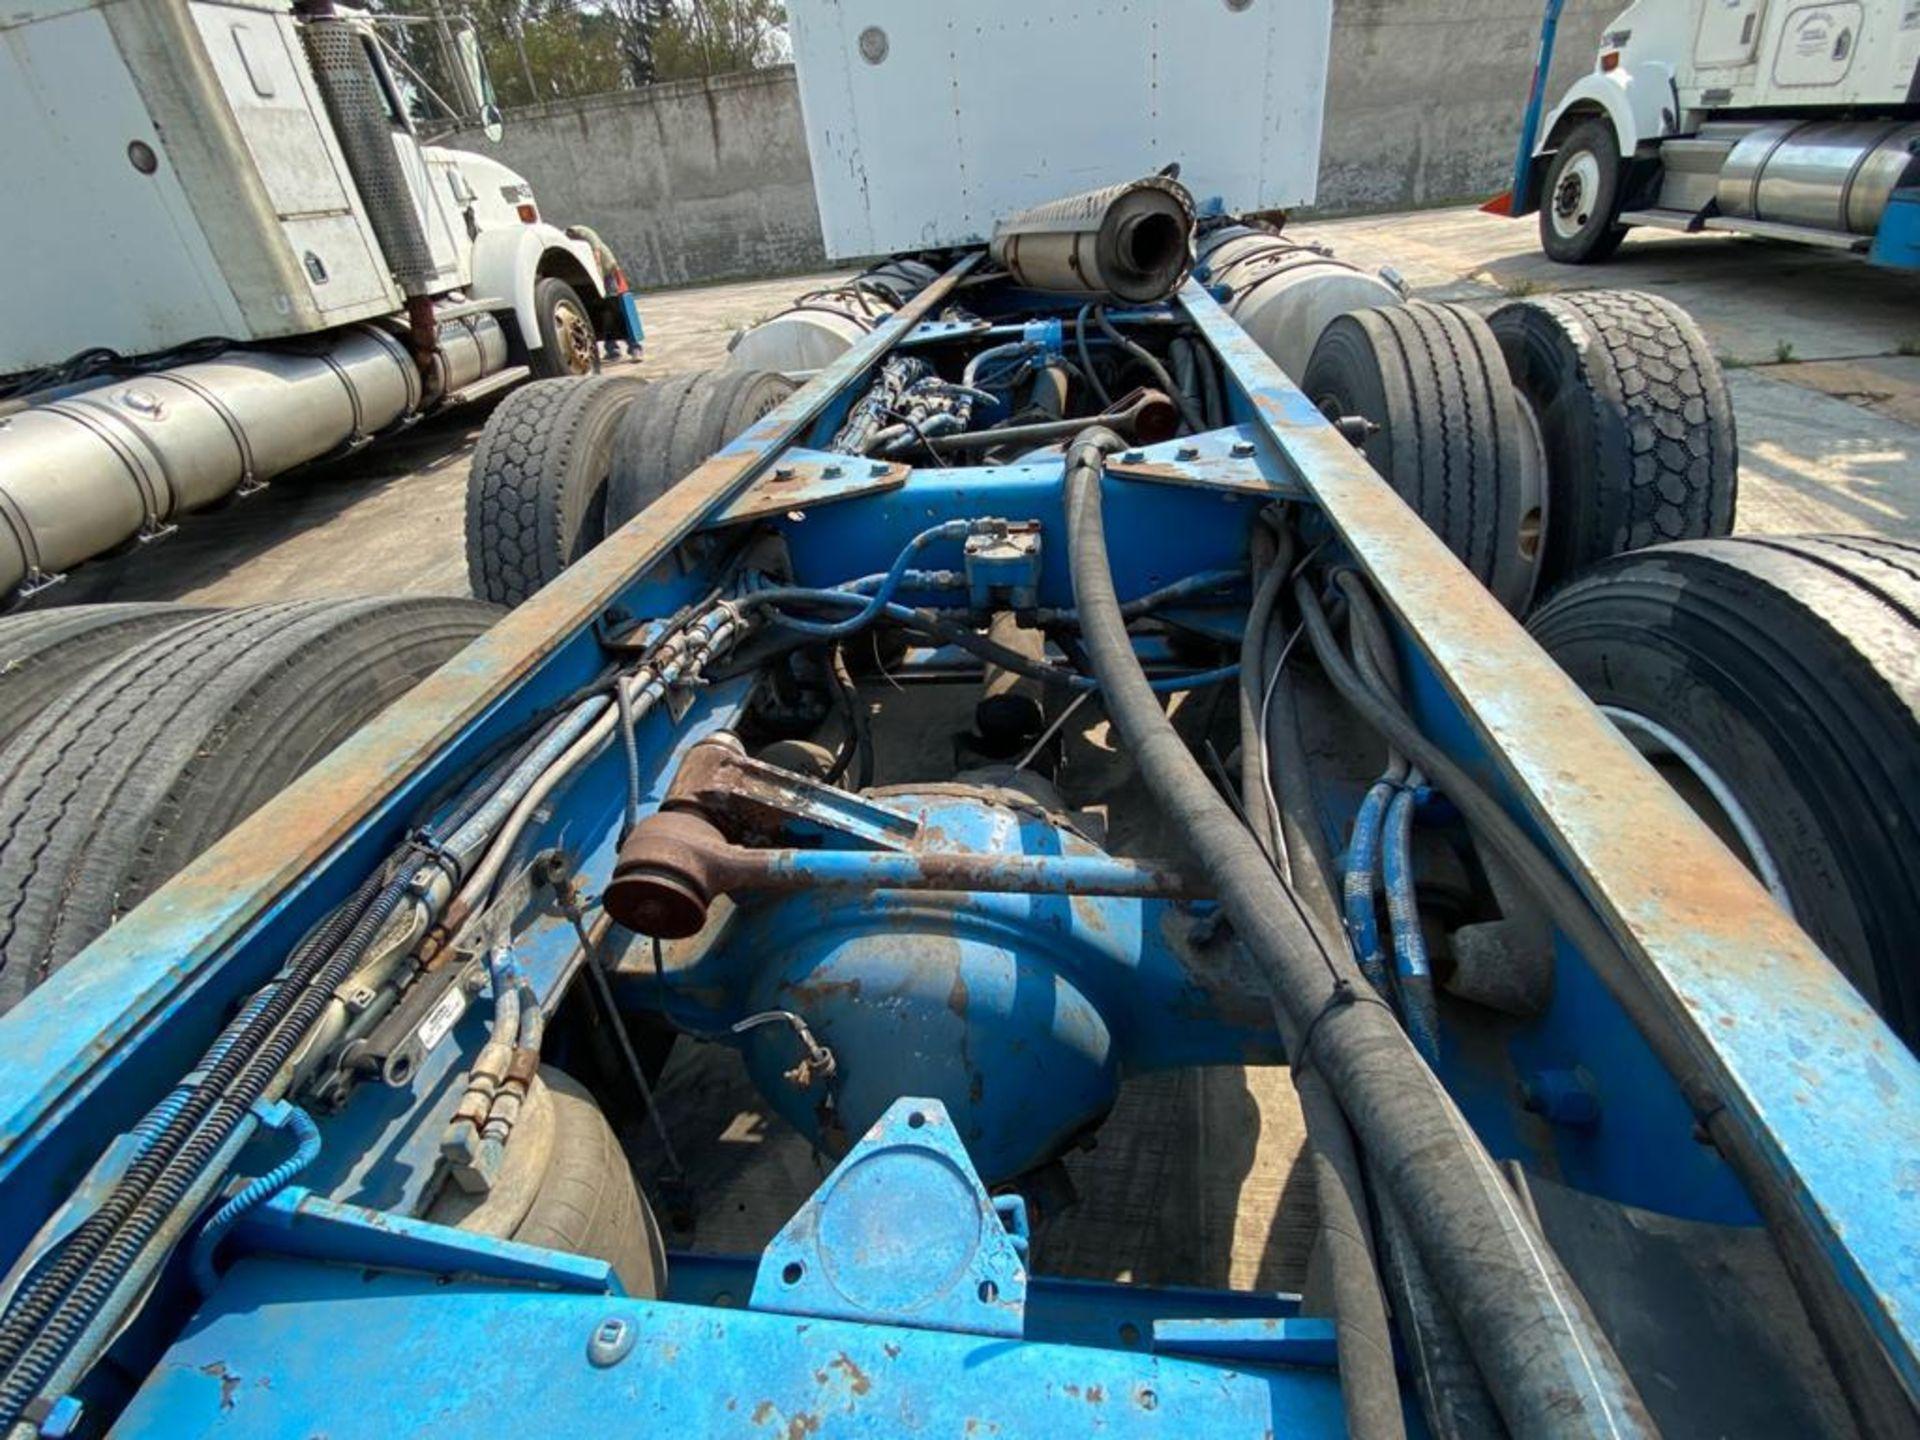 1999 Kenworth Sleeper truck tractor, standard transmission of 18 speeds - Image 21 of 72